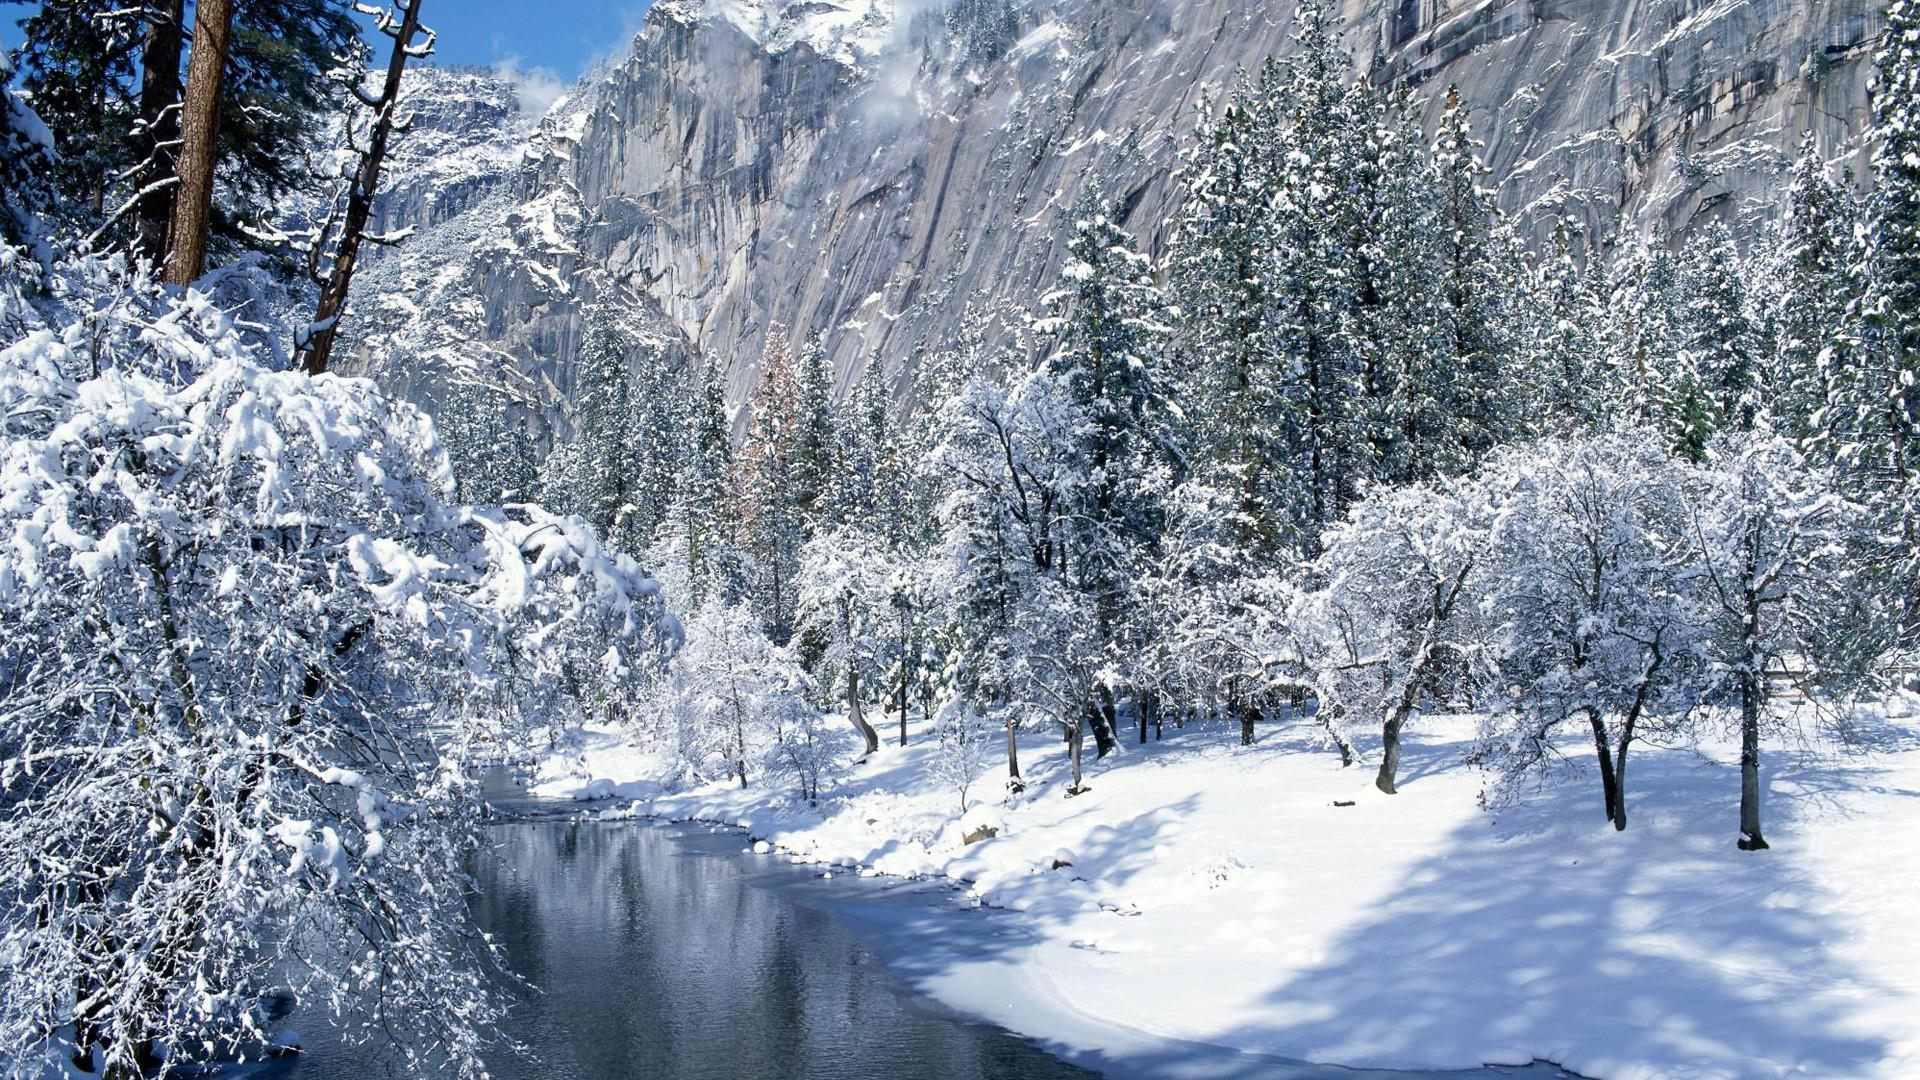 Free Microsoft Screensavers Winter Scene WINTER SCENES FOR WINDOWS